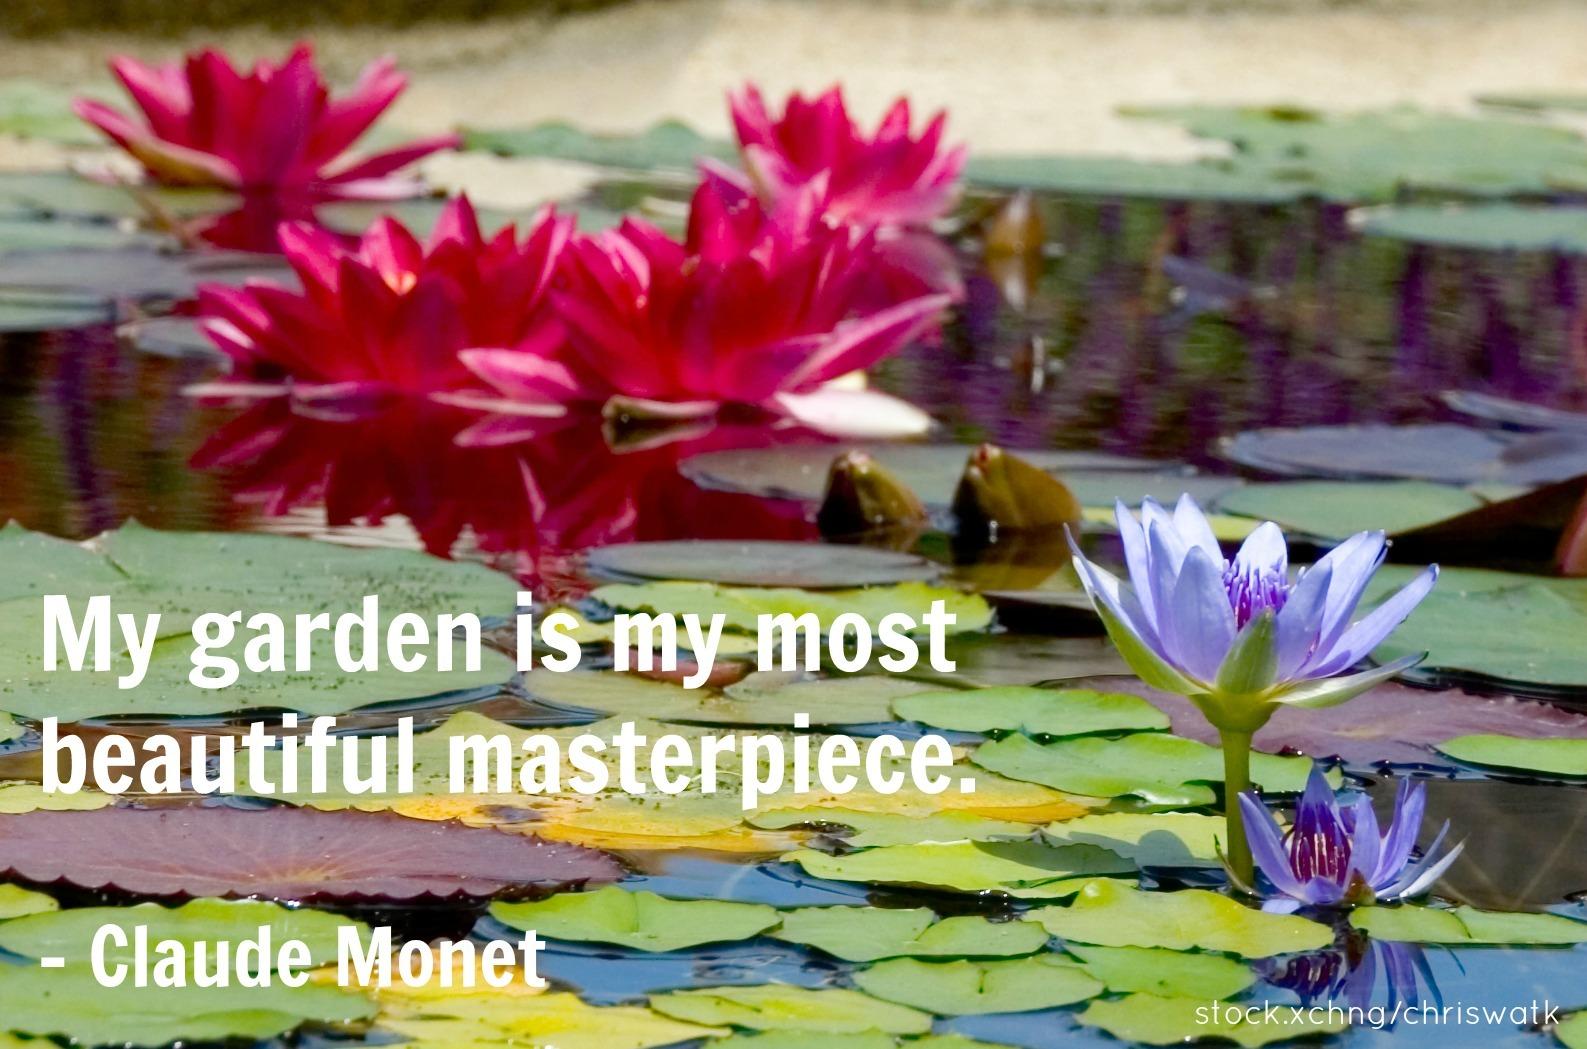 Claude Monet gardening quote